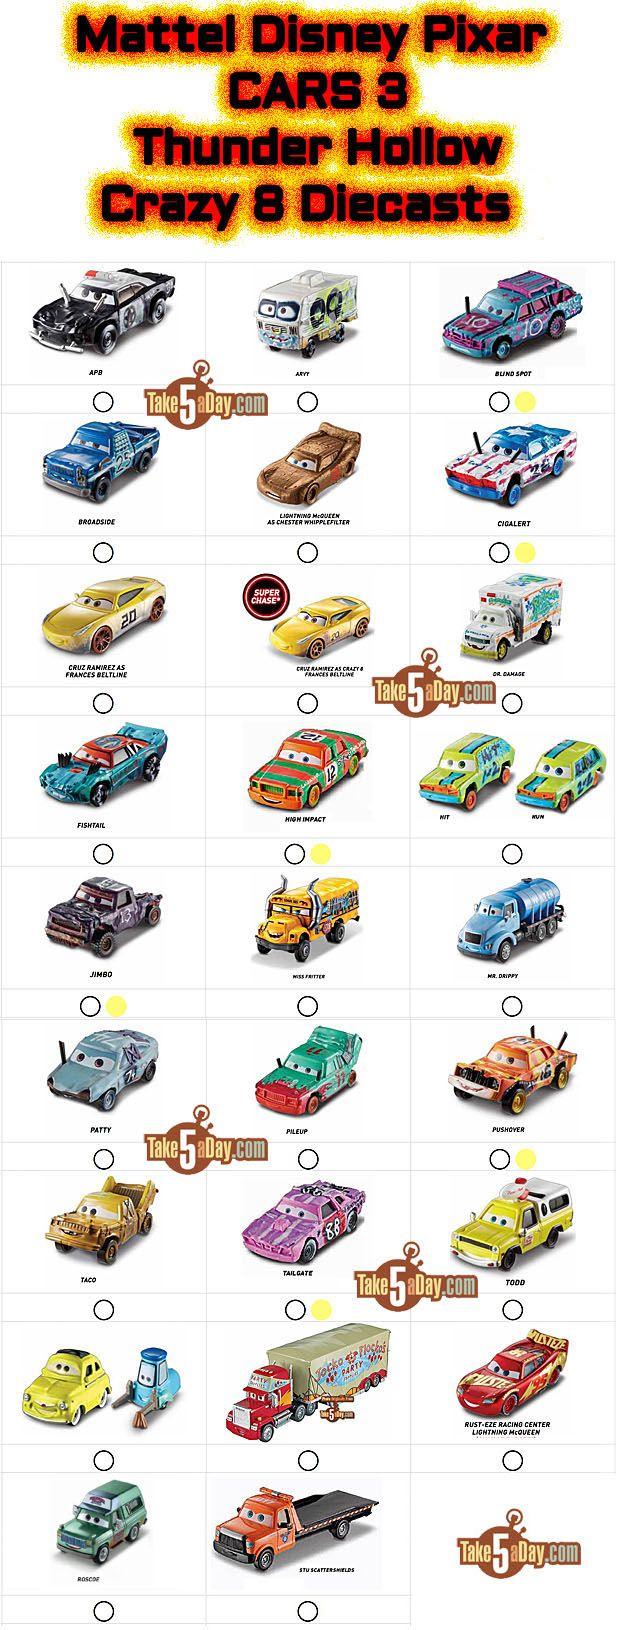 Mattel Disney Pixar CARS 3: Thunder Hollow Crazy 8 Derby Diecasts Checklist | Take Five a Day